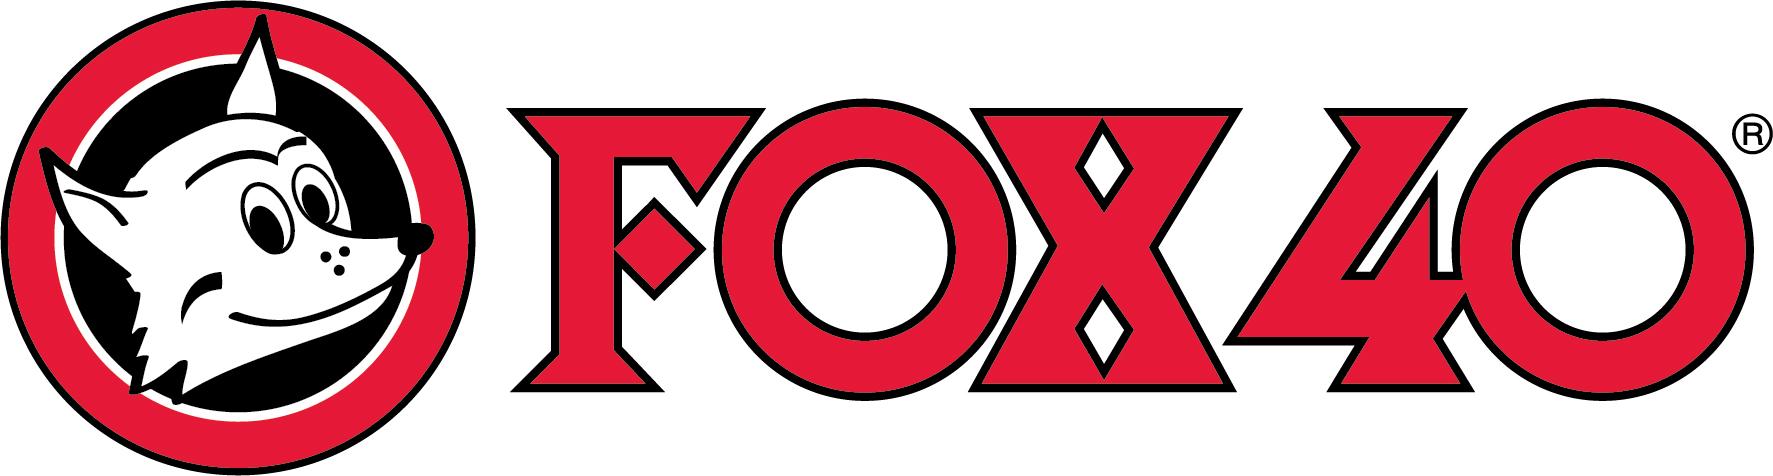 fox40logo